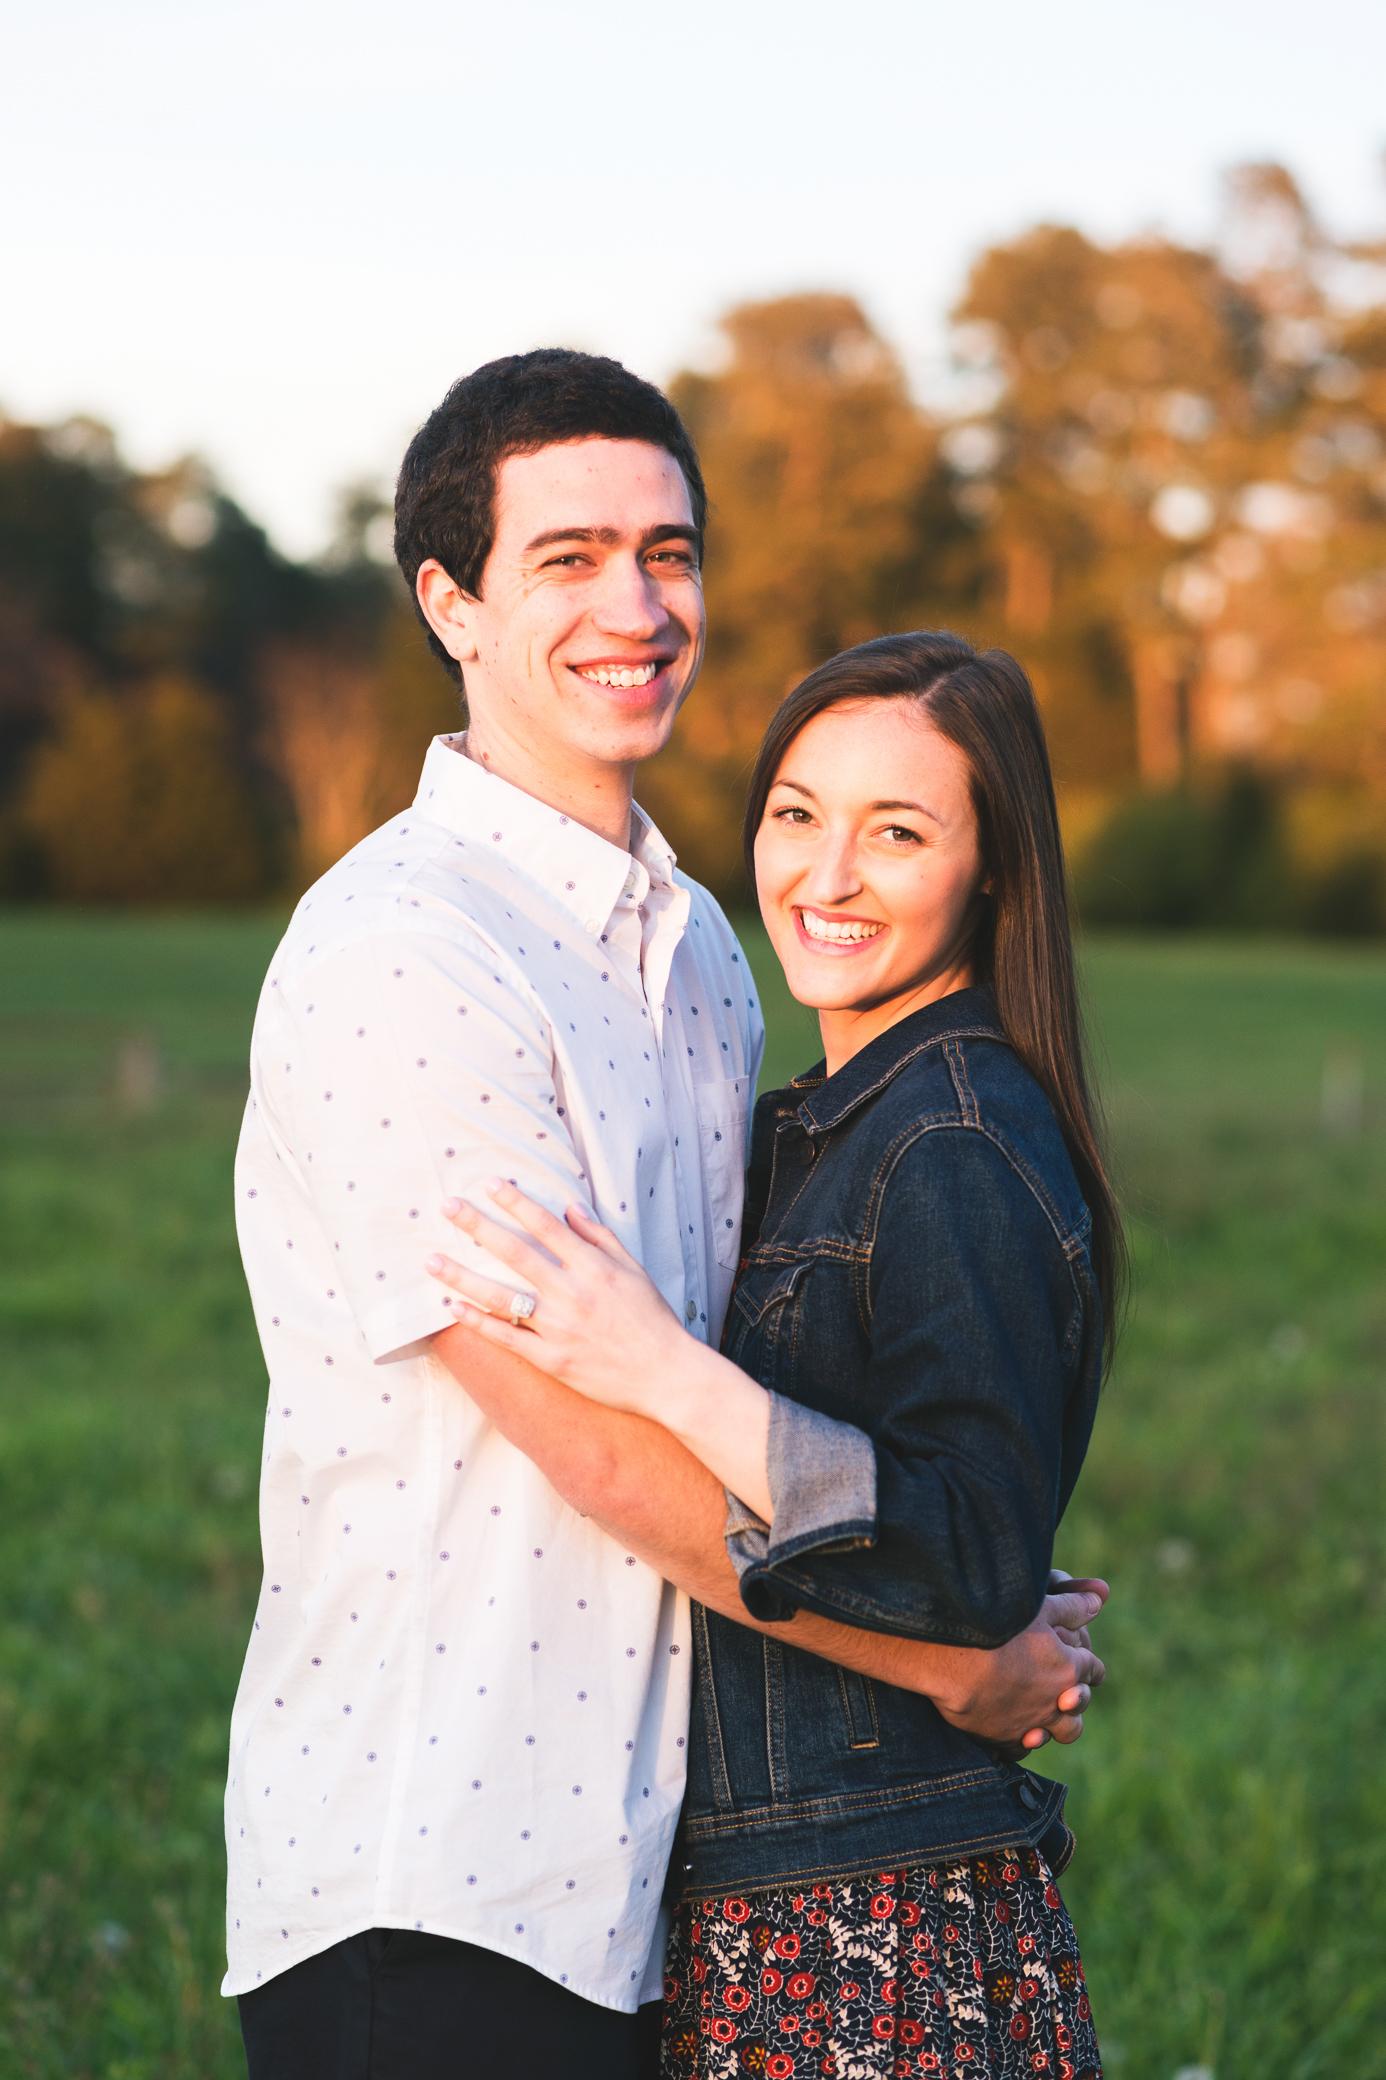 Engagement_Jason&ShelbyMohn_edits-29.jpg